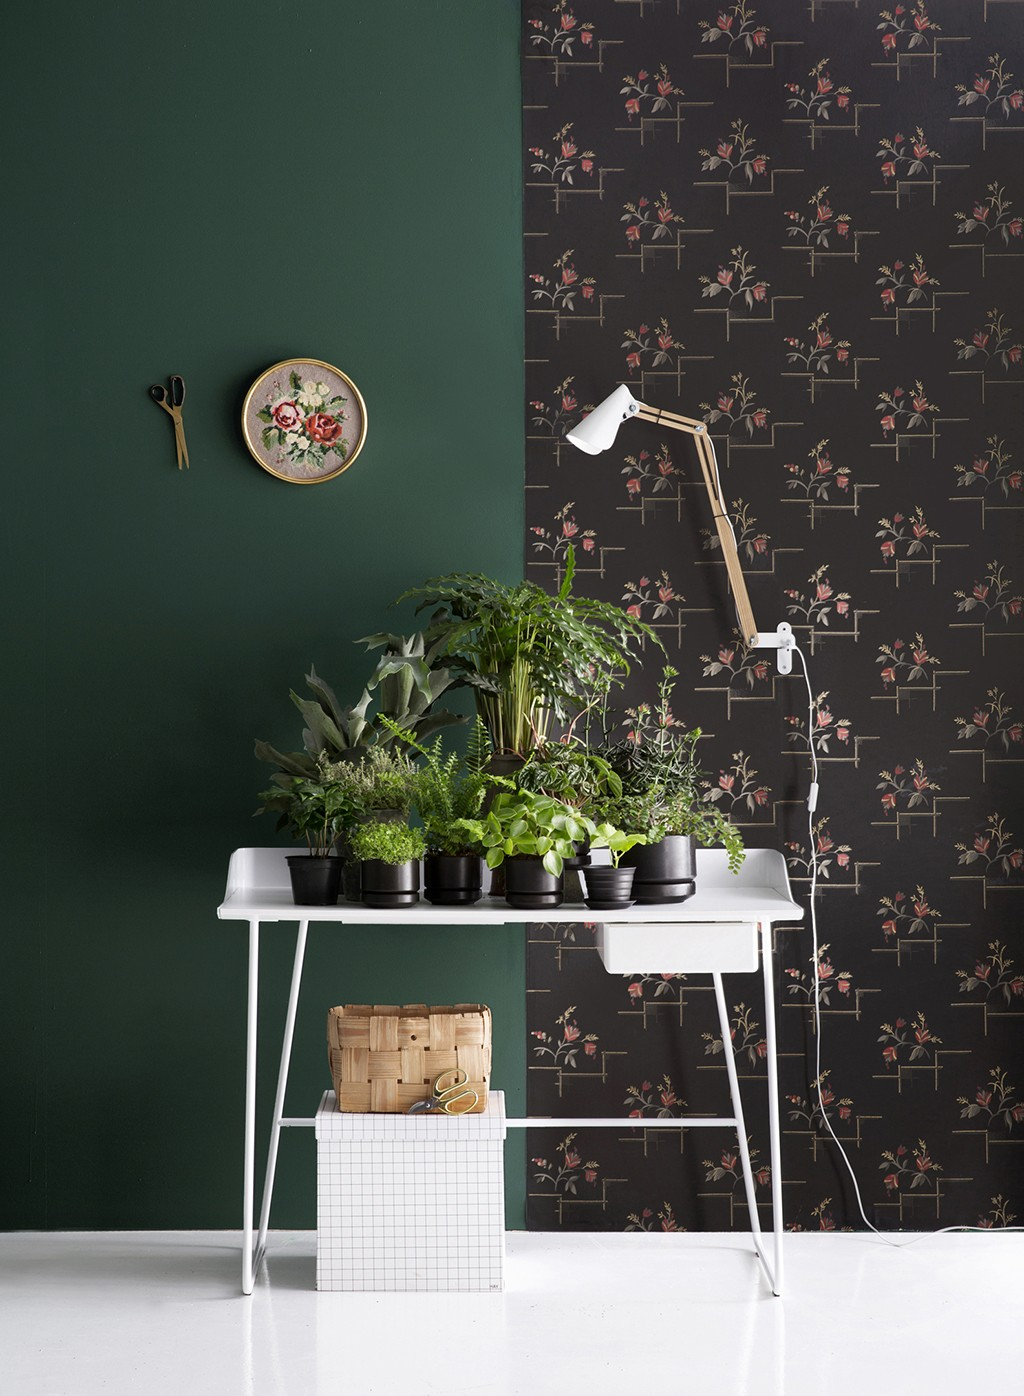 Green is a new black for Deko-magazine by Susanna Vento